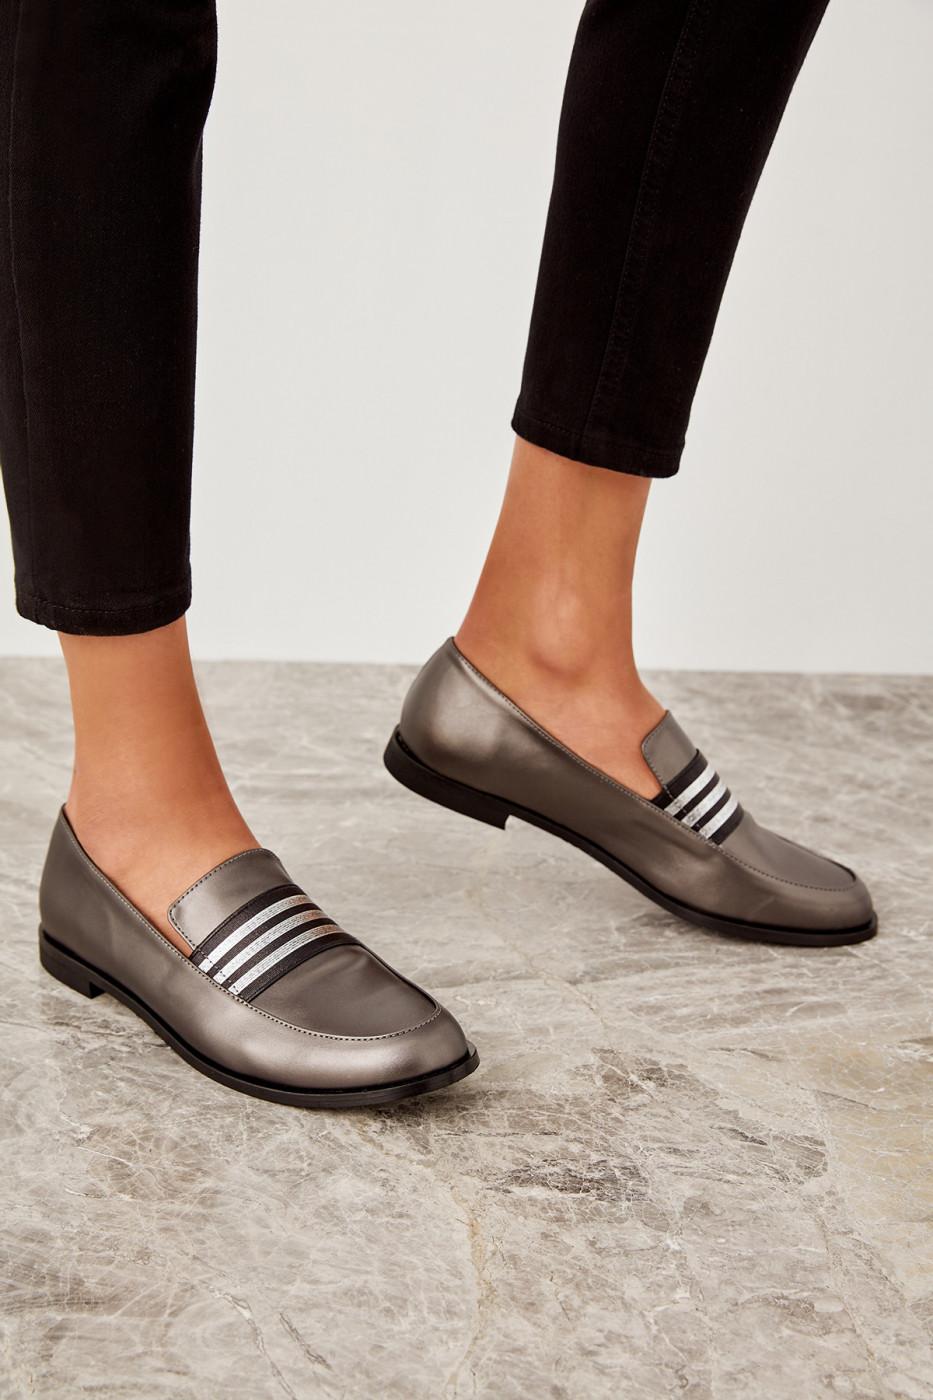 Trendyol Silver Women's Loafer Shoes